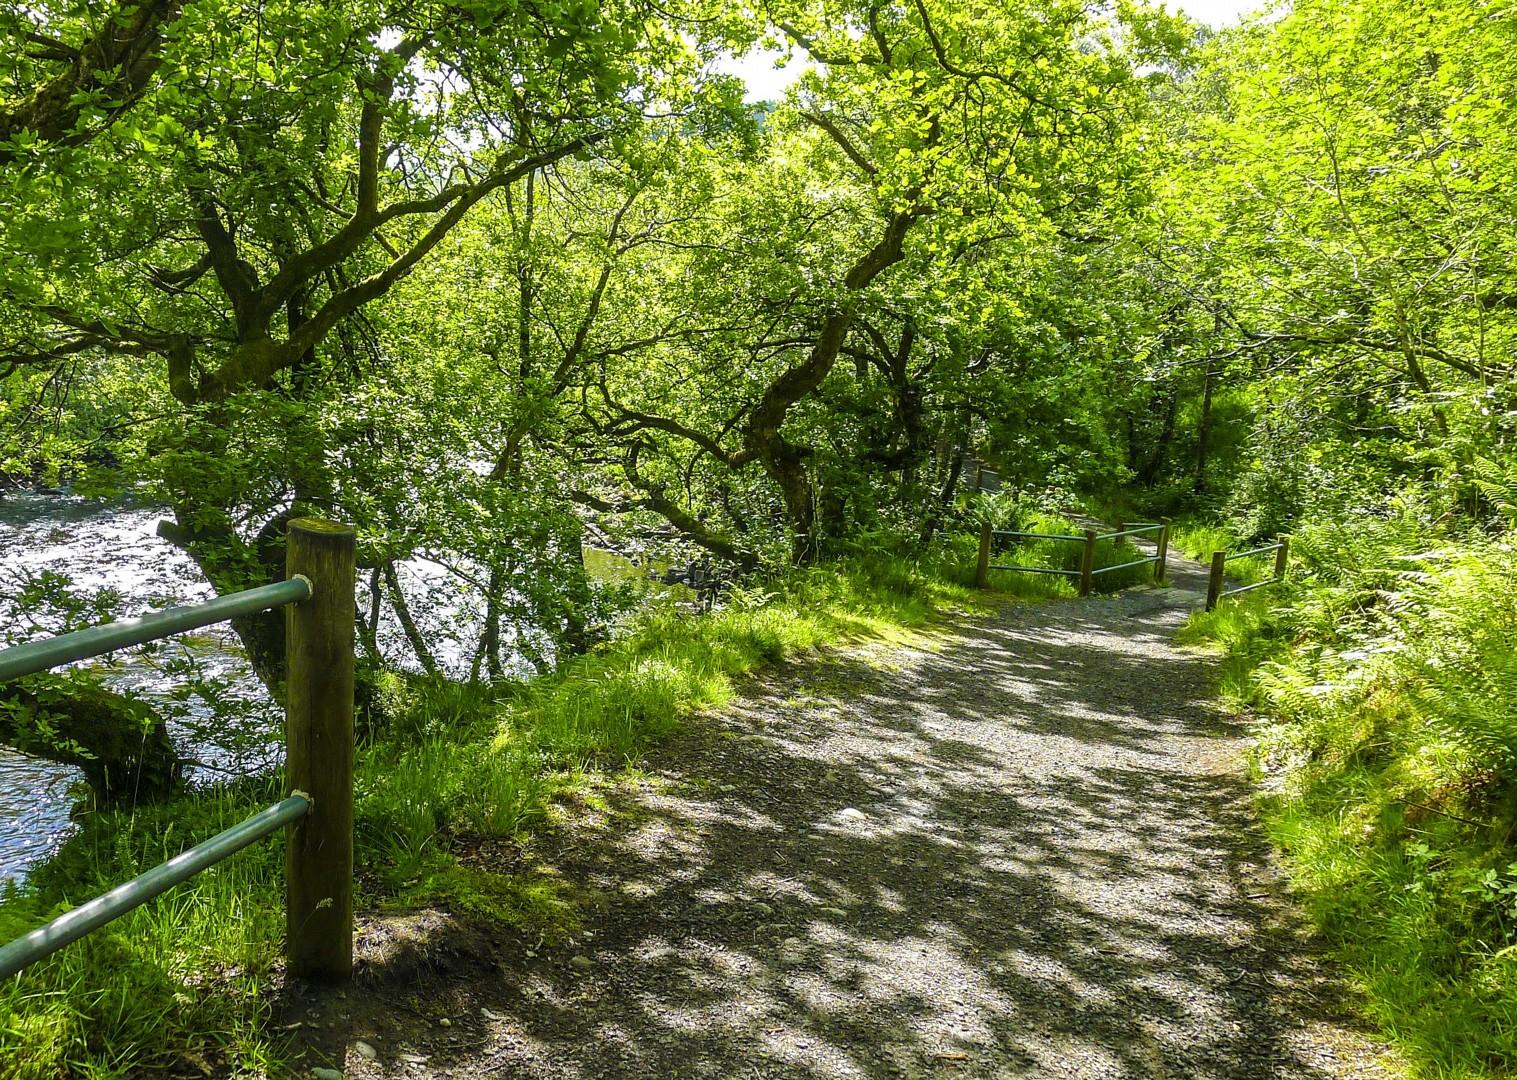 sustrans-traffic-free-cycle-paths-holiday-scotland-uk-skedaddle.jpg - NEW! UK - Scotland - Lochs and Glens - Guided Leisure Cycling Holiday - Leisure Cycling